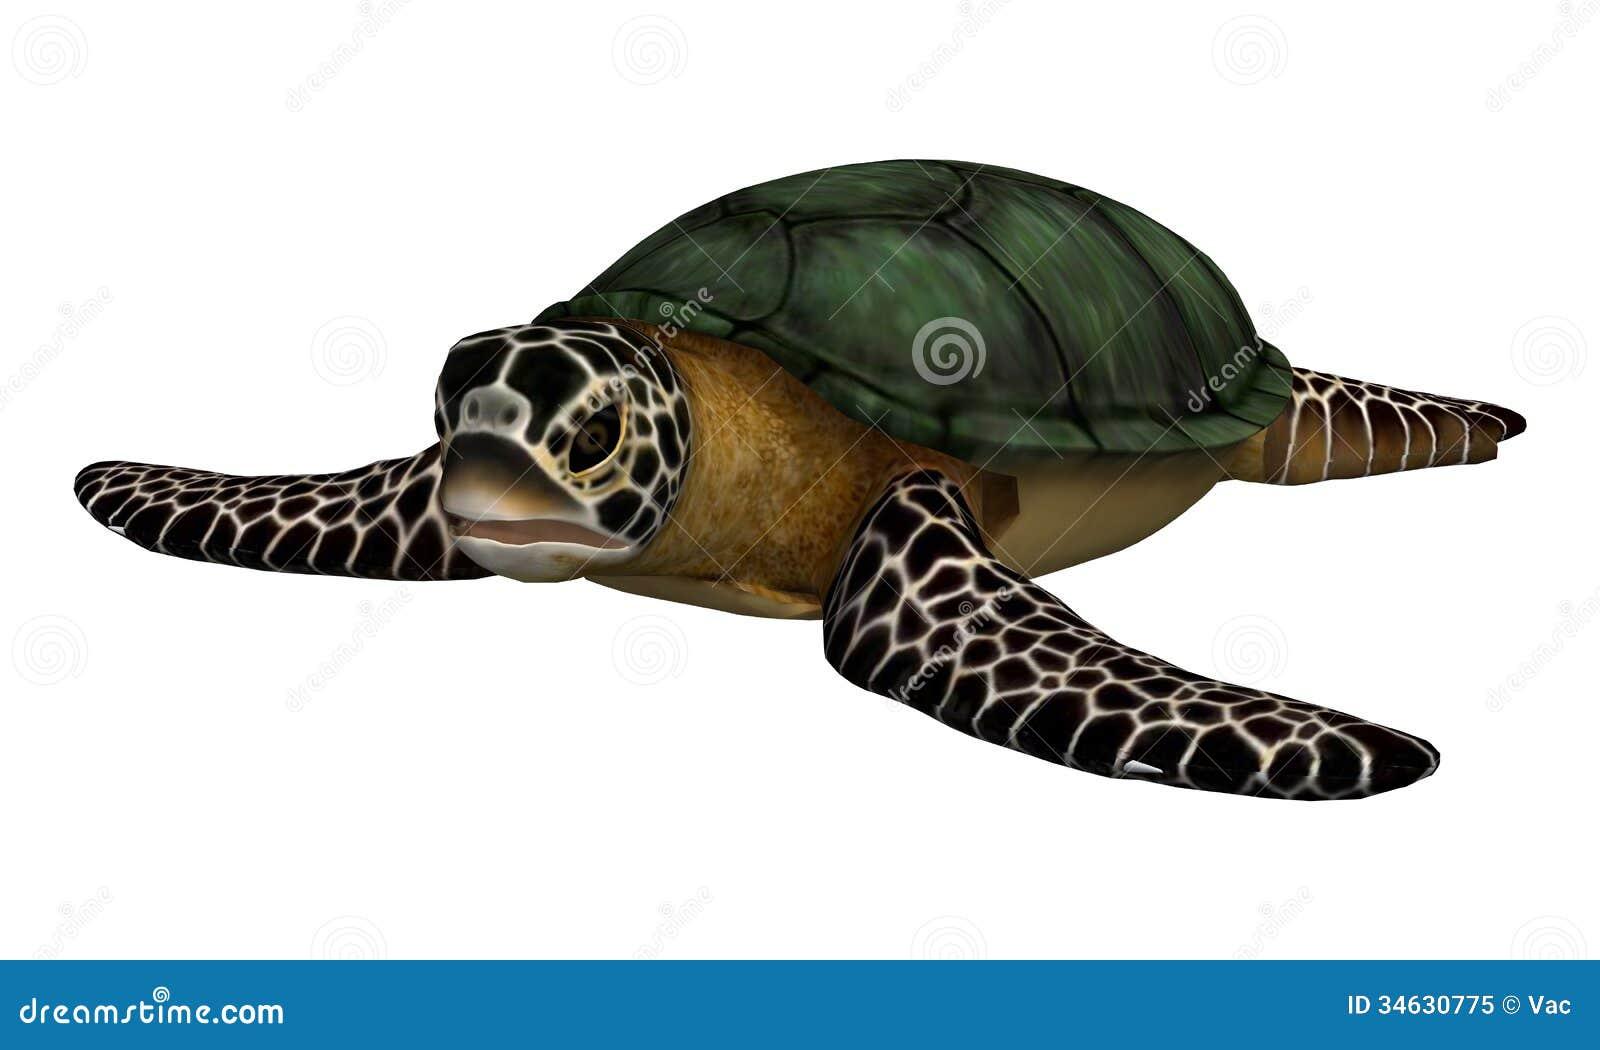 Sea Turtle Royalty Free Stock Photo Image 34630775